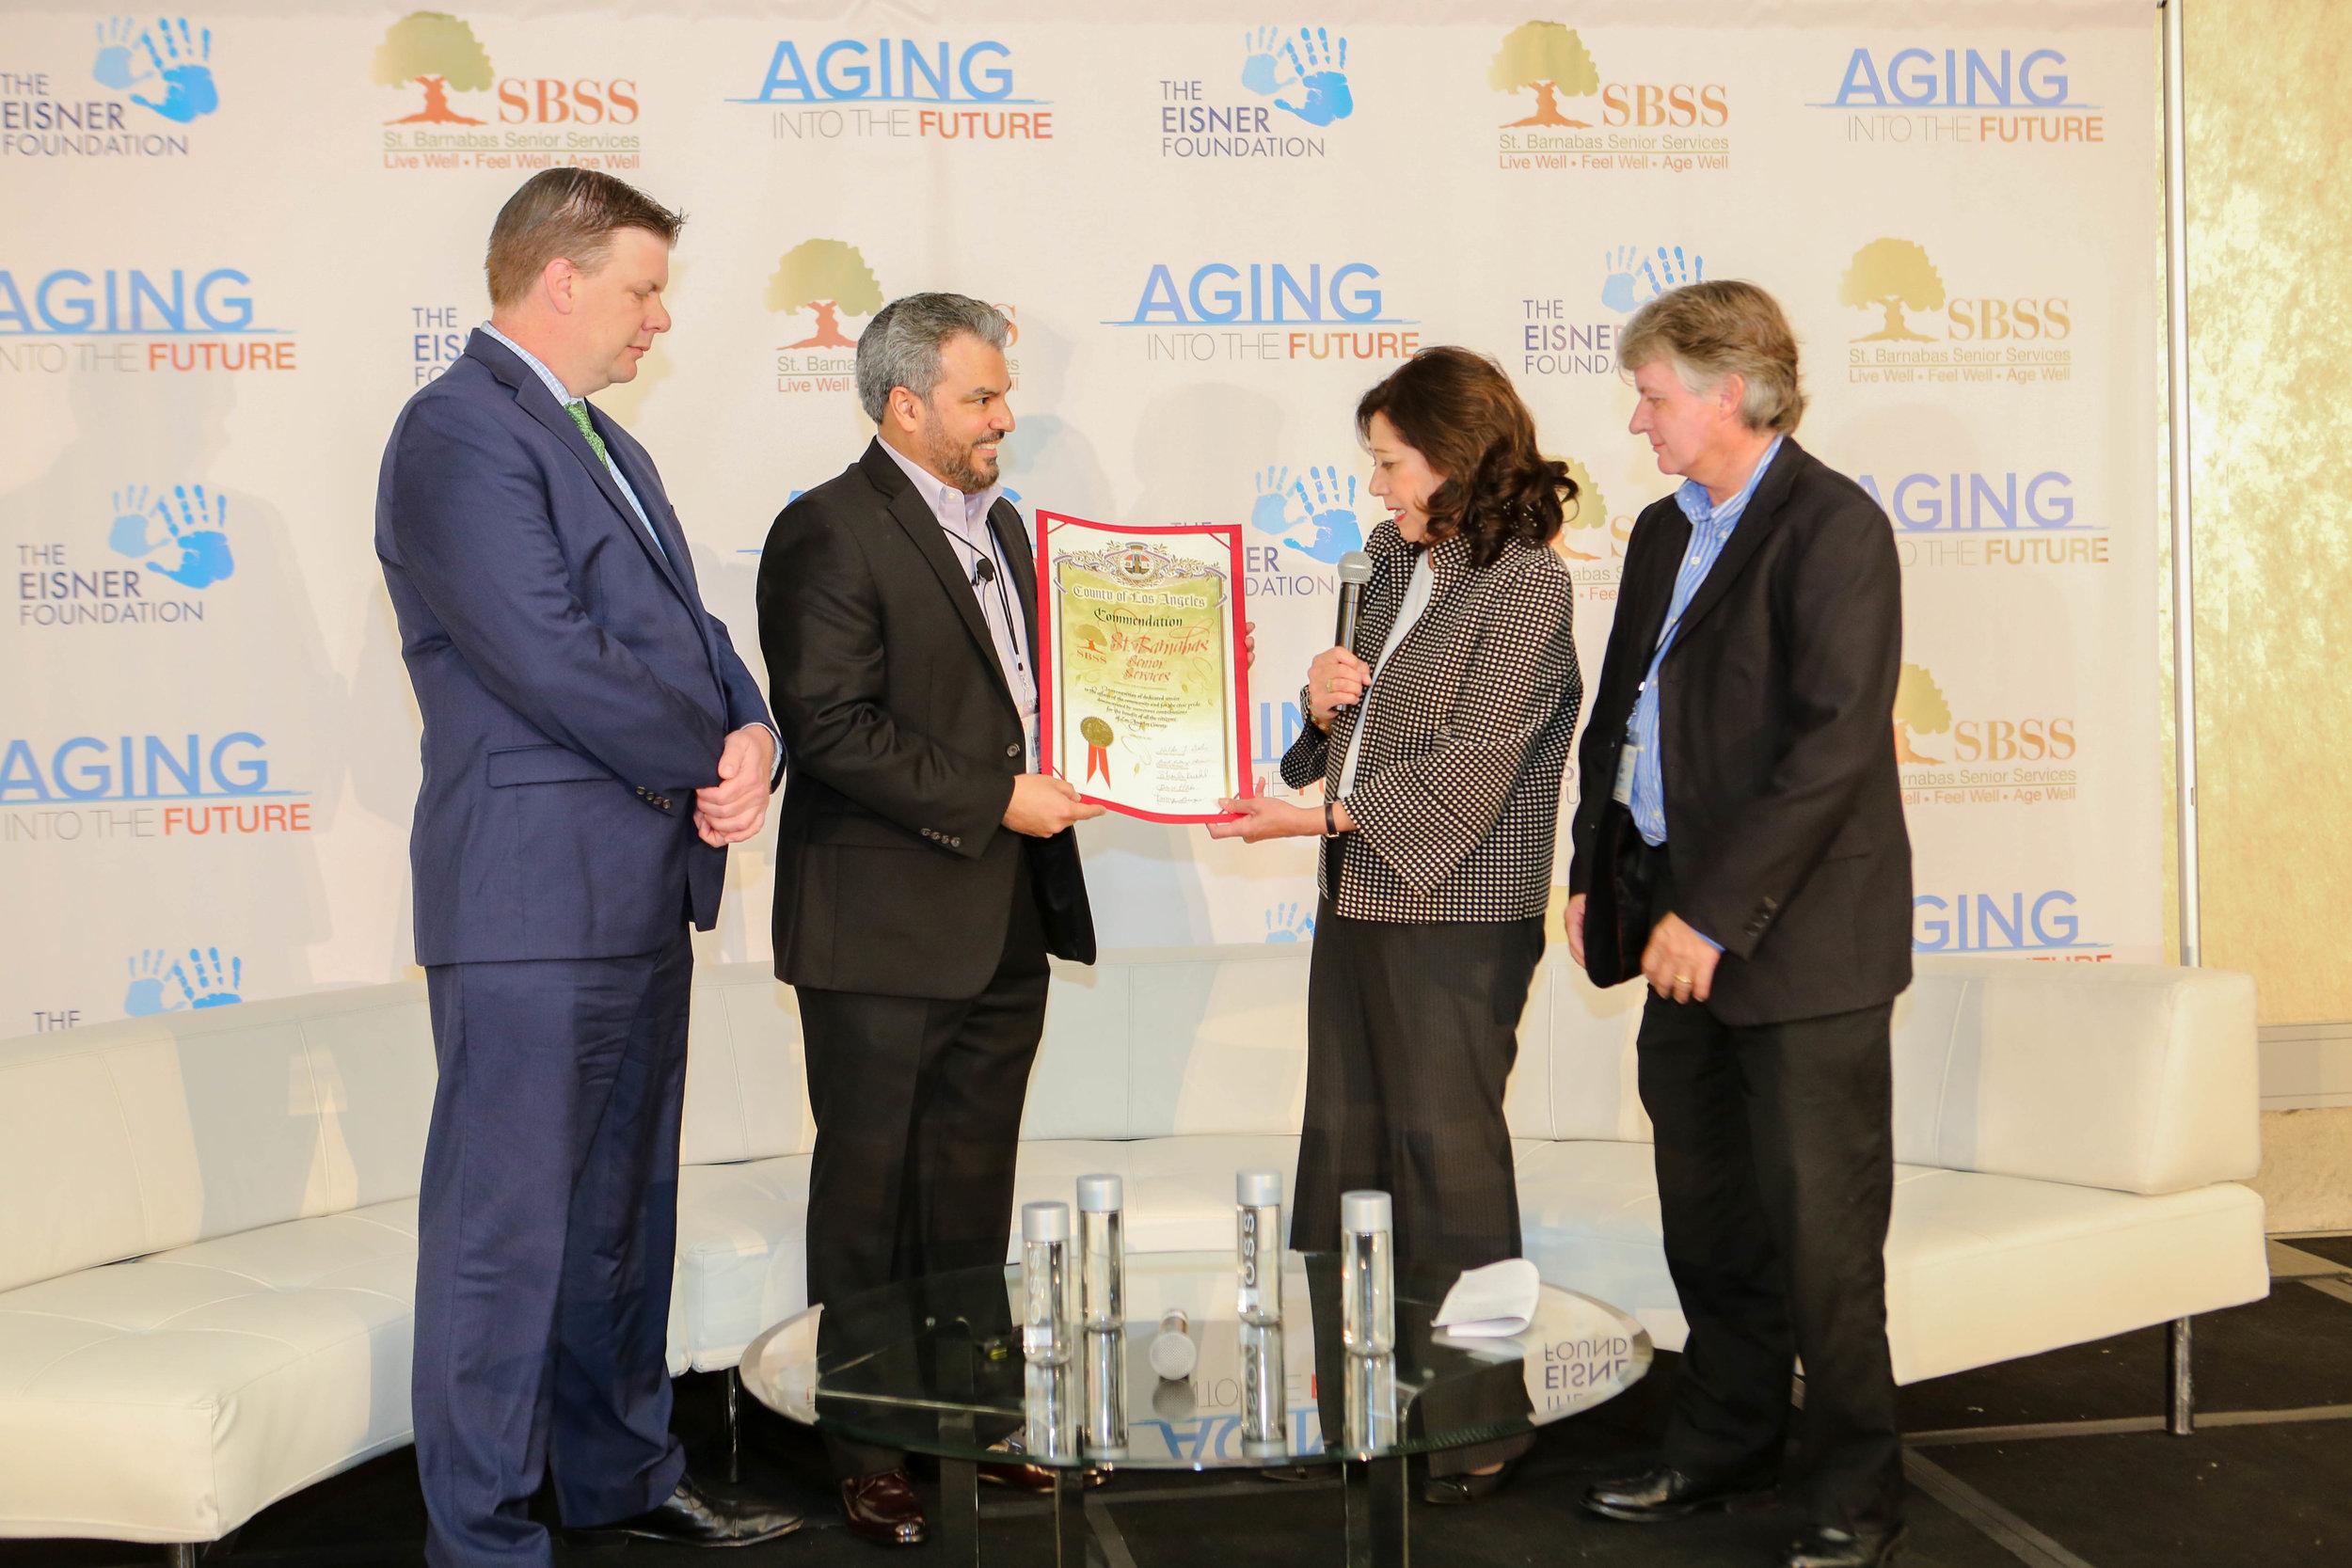 2017 AgingConference_202.jpg